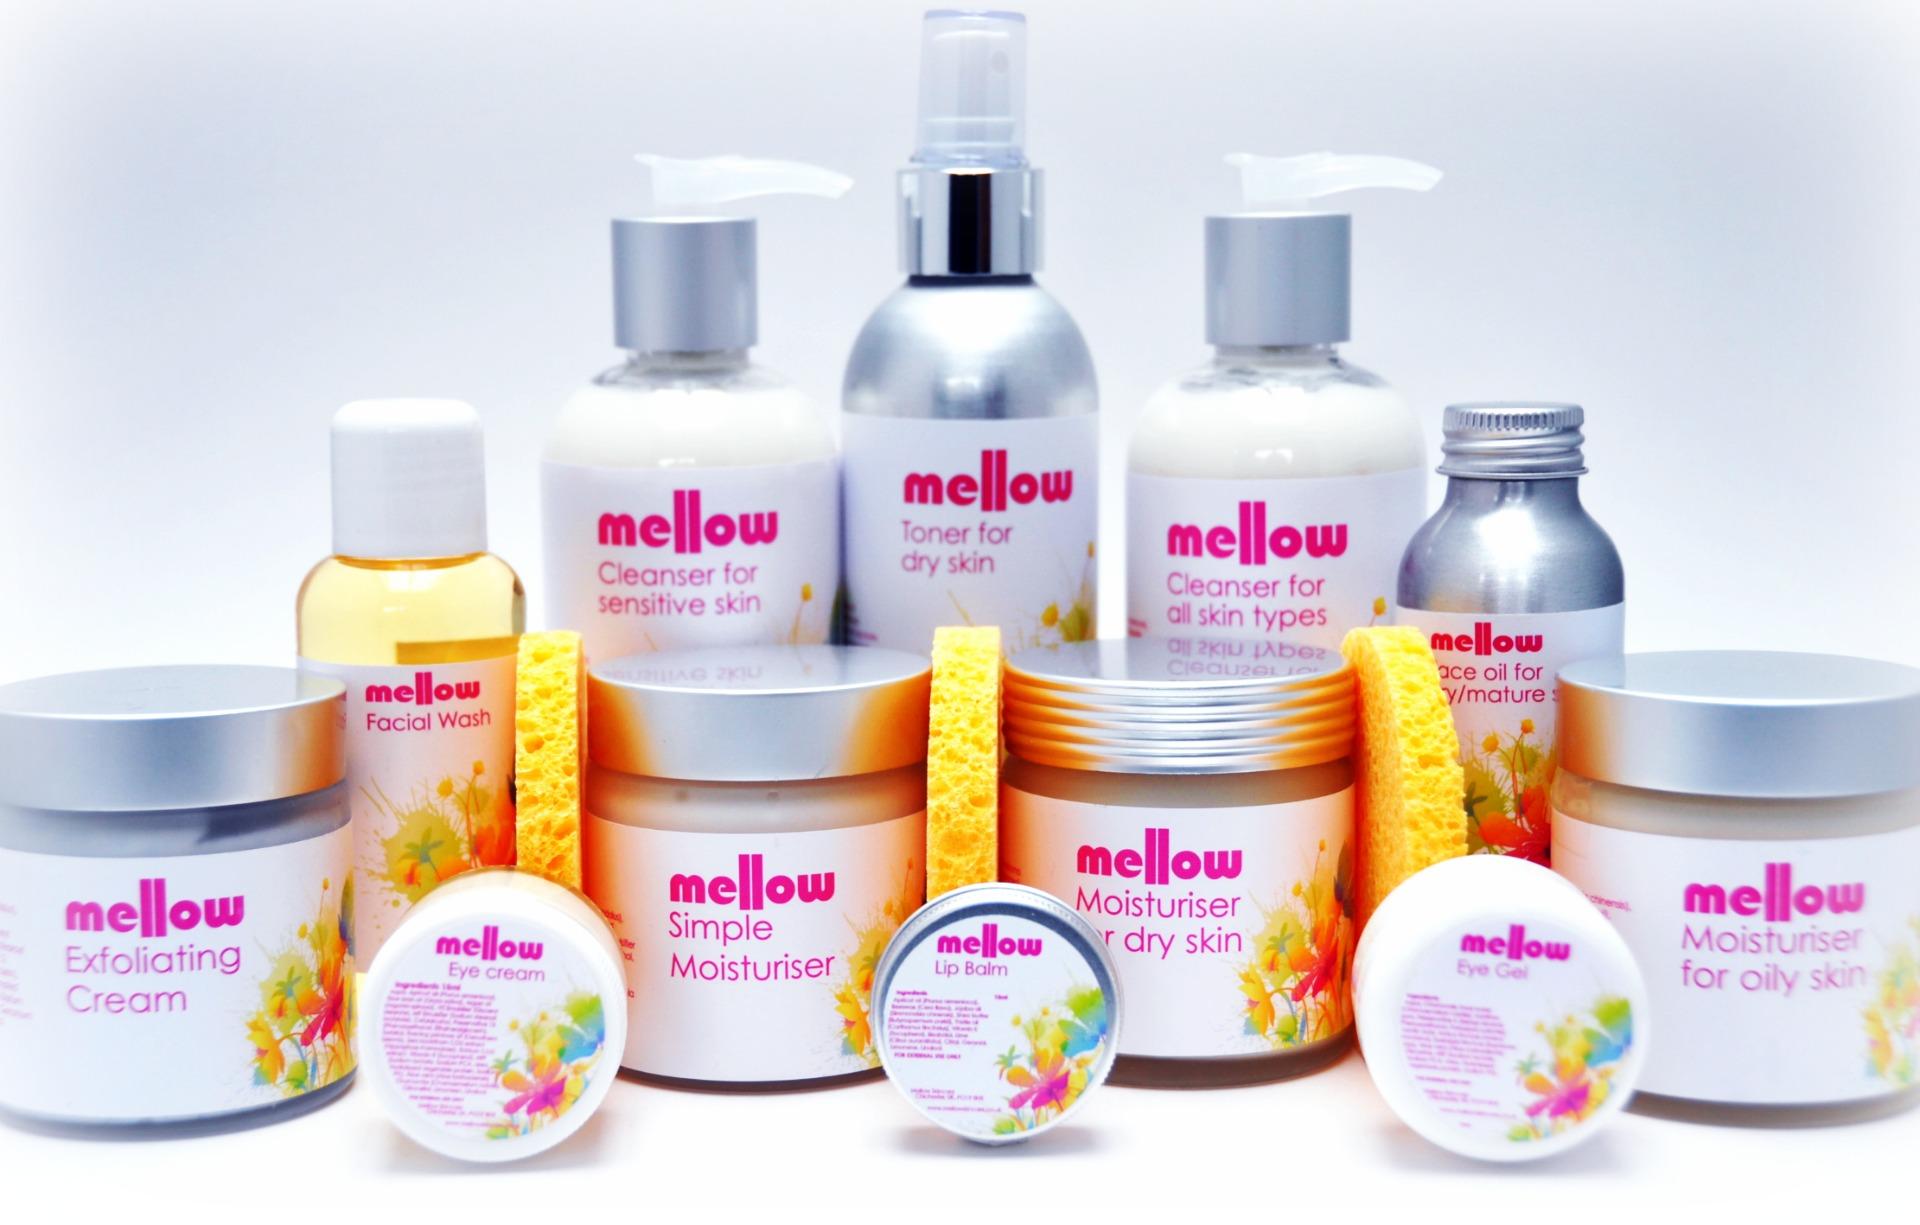 mellow-skincare-pamper-time-handmade-face-cream